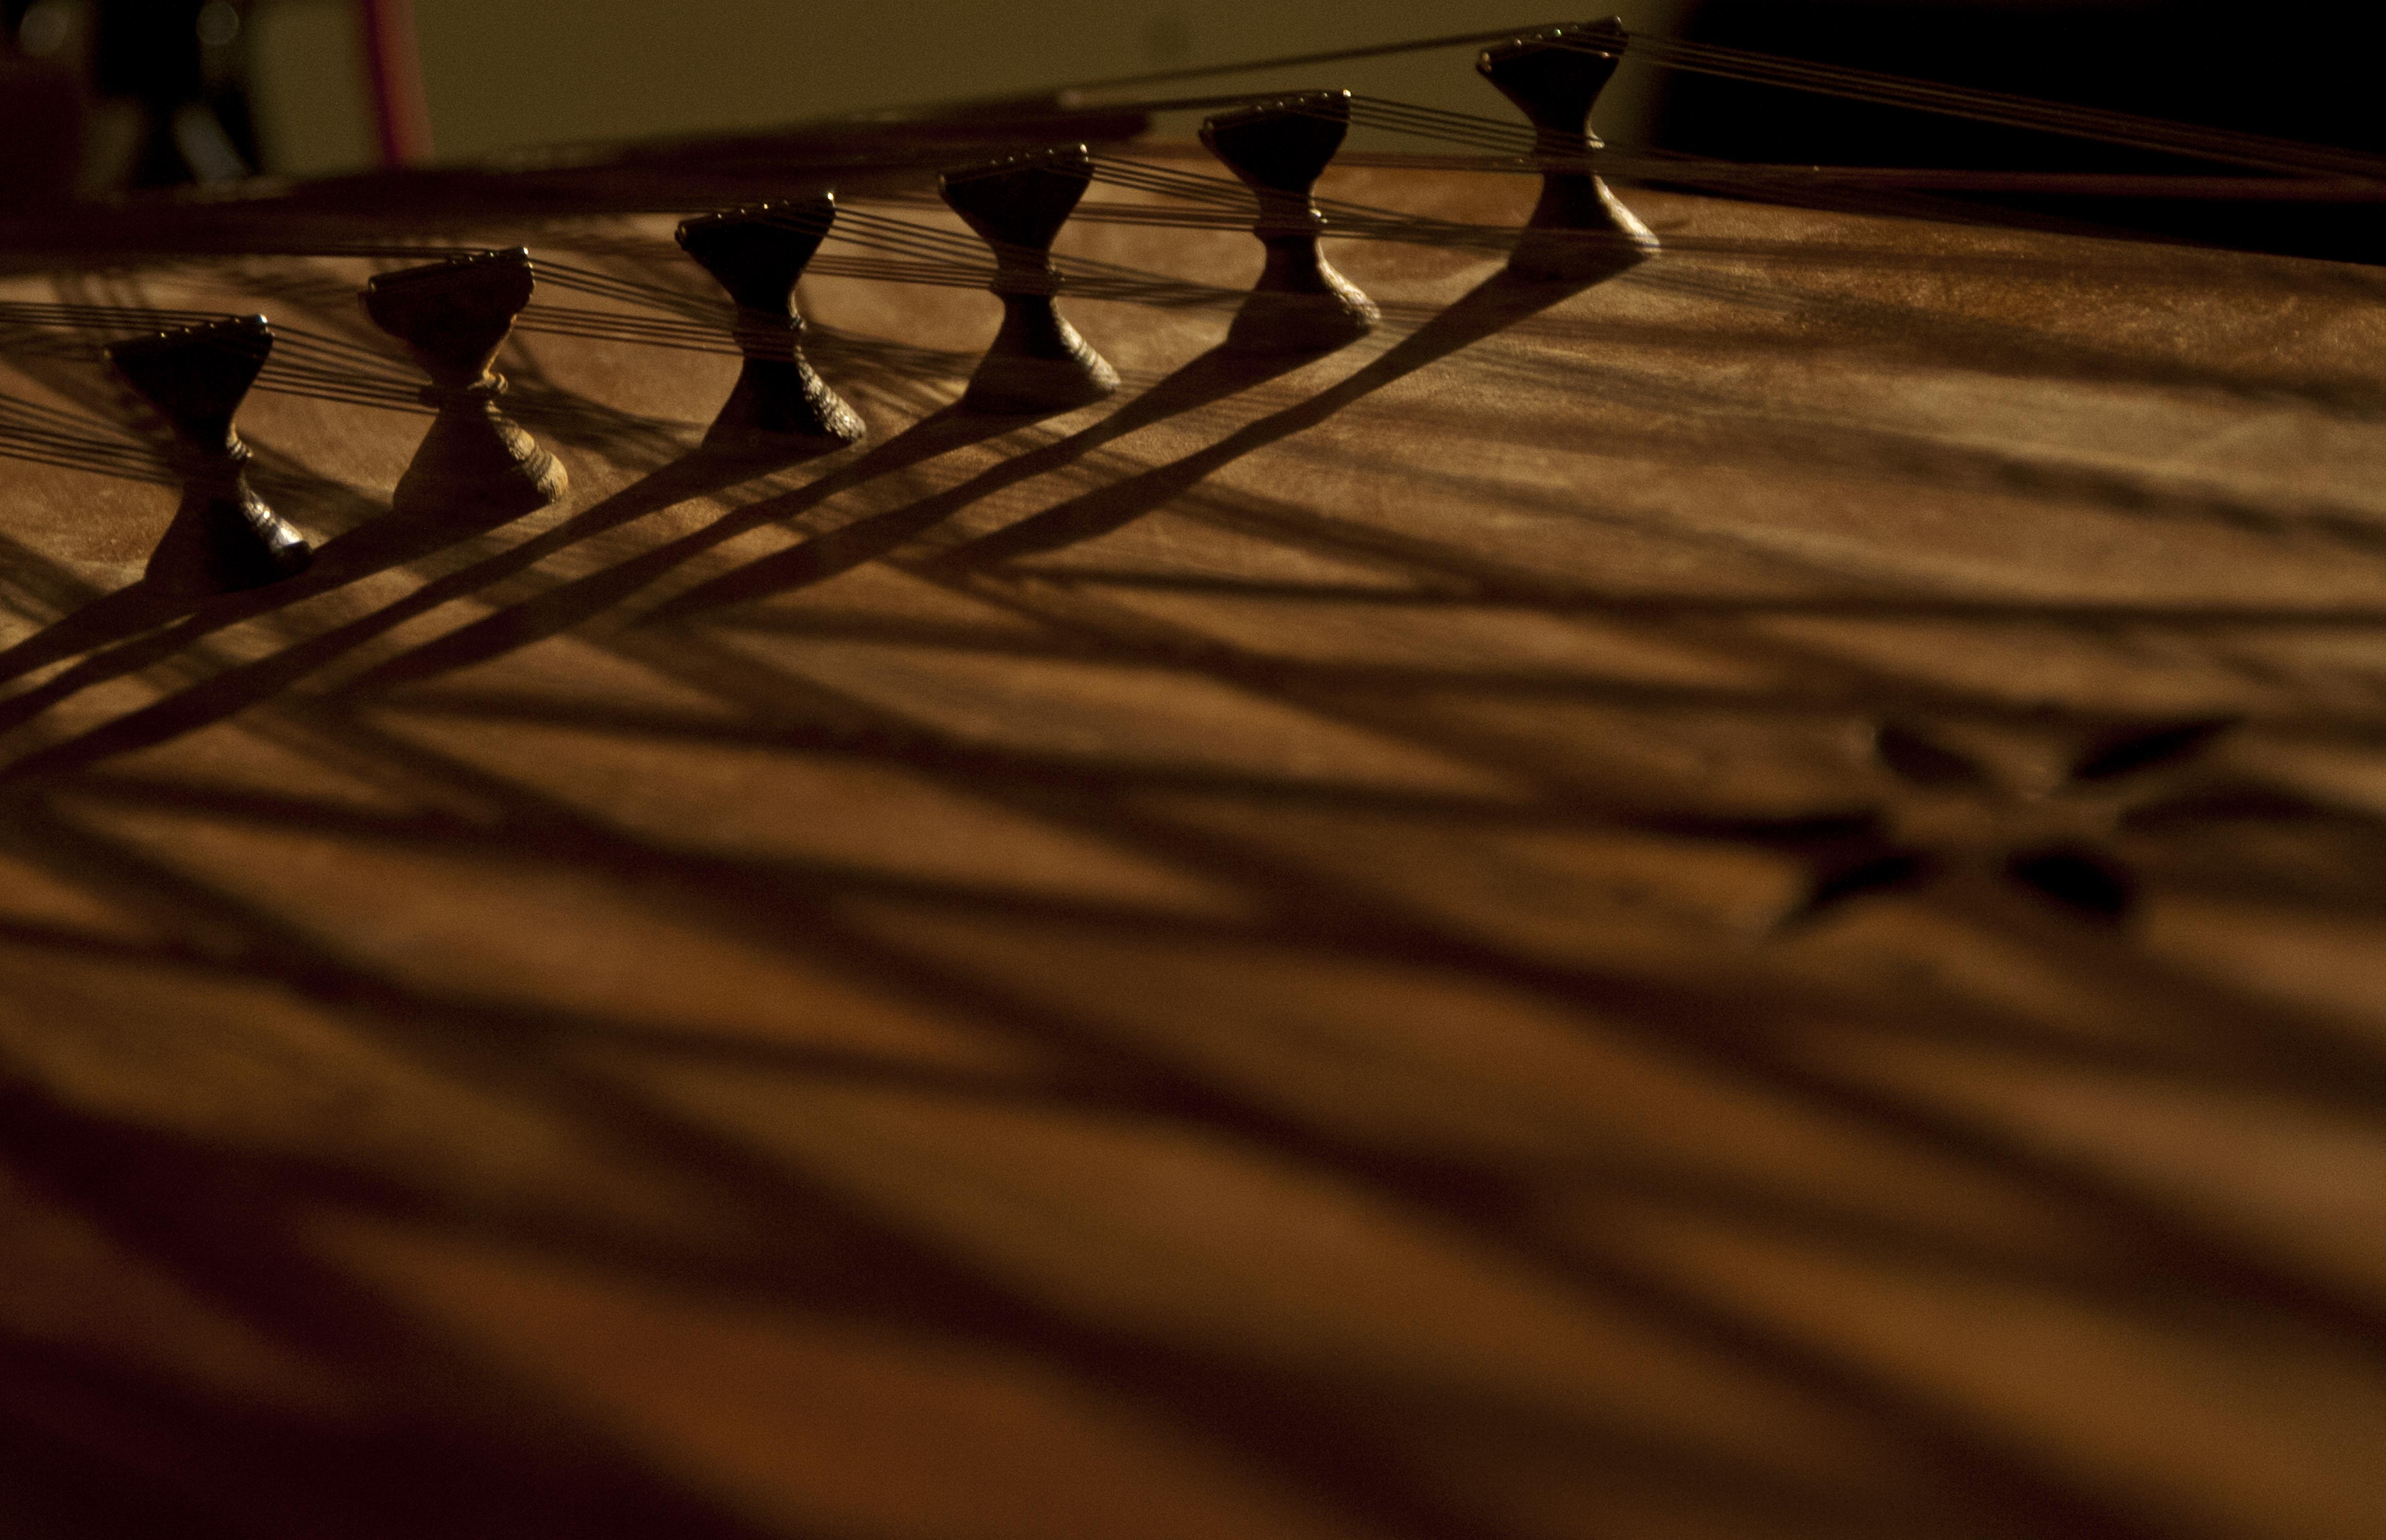 File:Santur Persian Musical-Instrument-Photo-by Dena ...